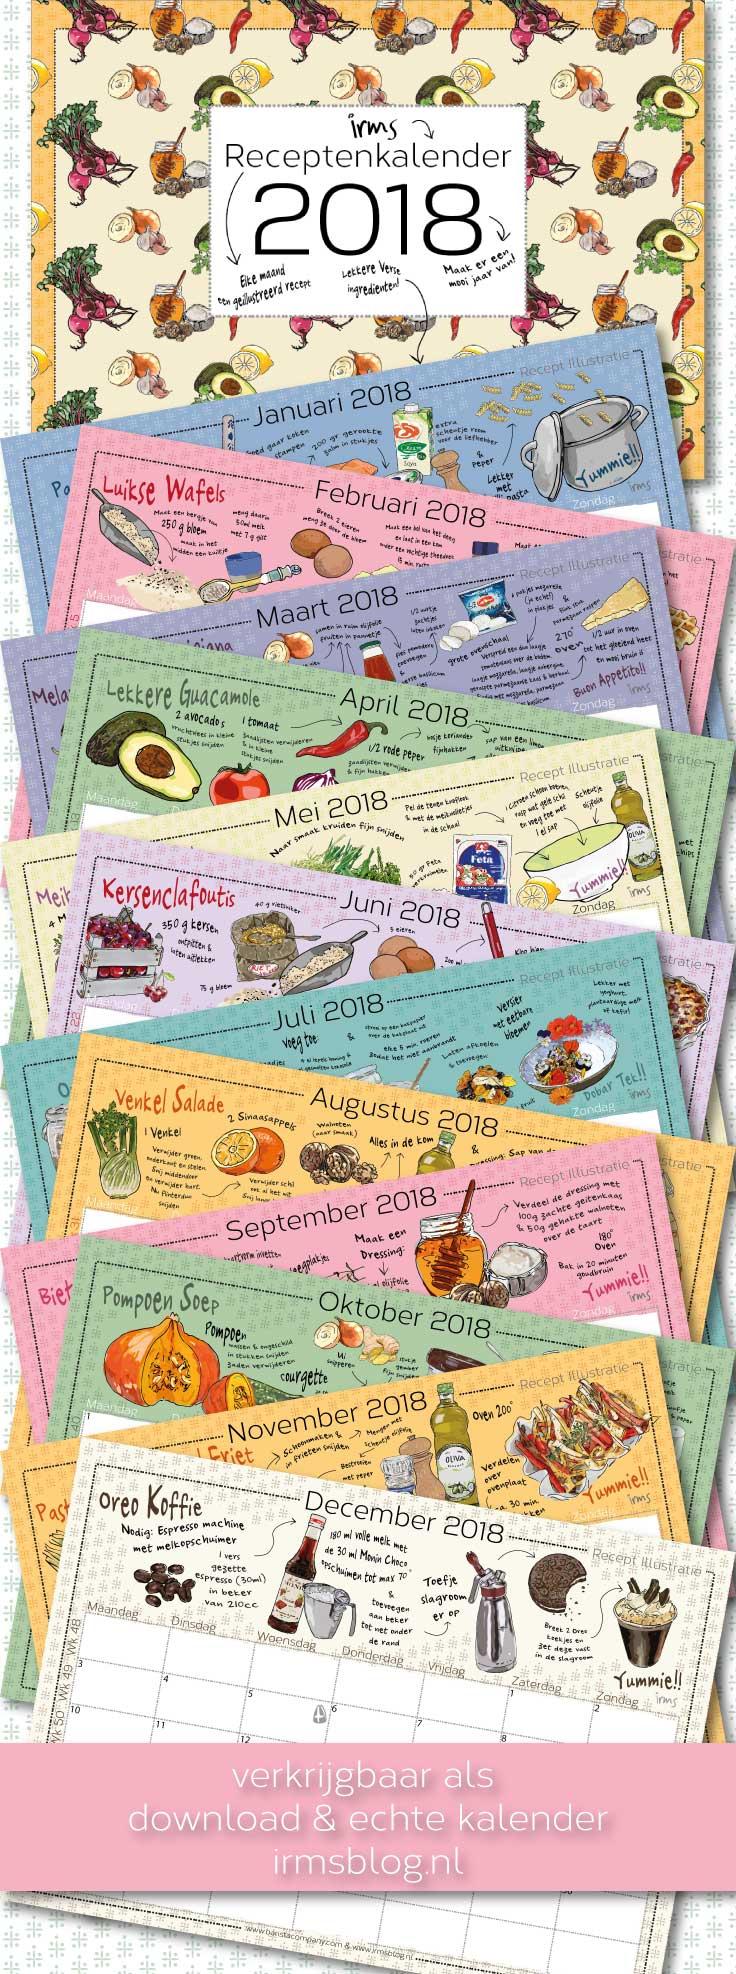 receptenkalender-2018-irms